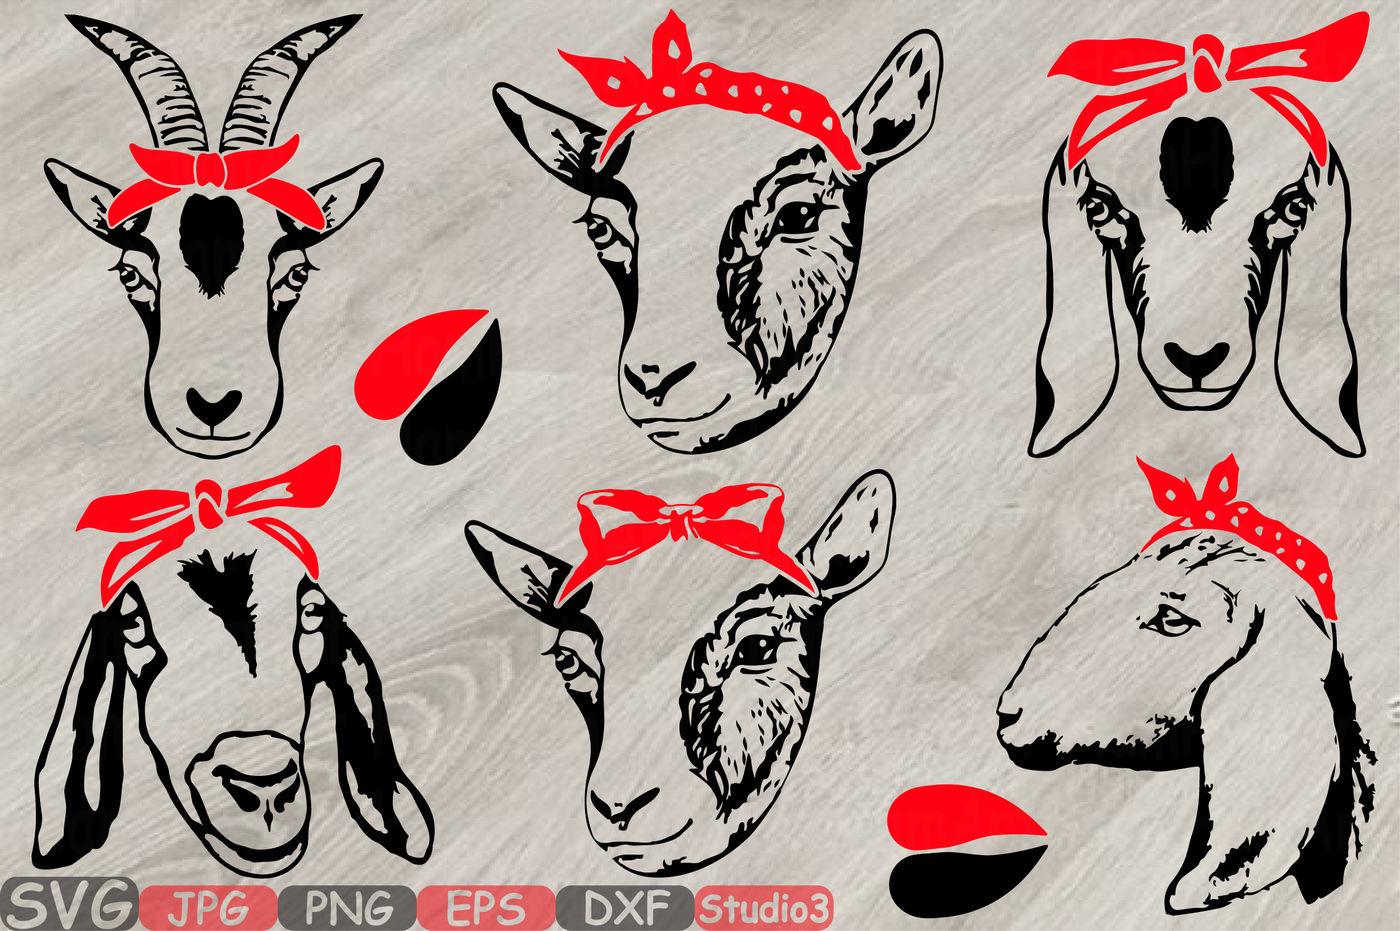 Download Download Bandana Design Svg for Cricut, Silhouette ...